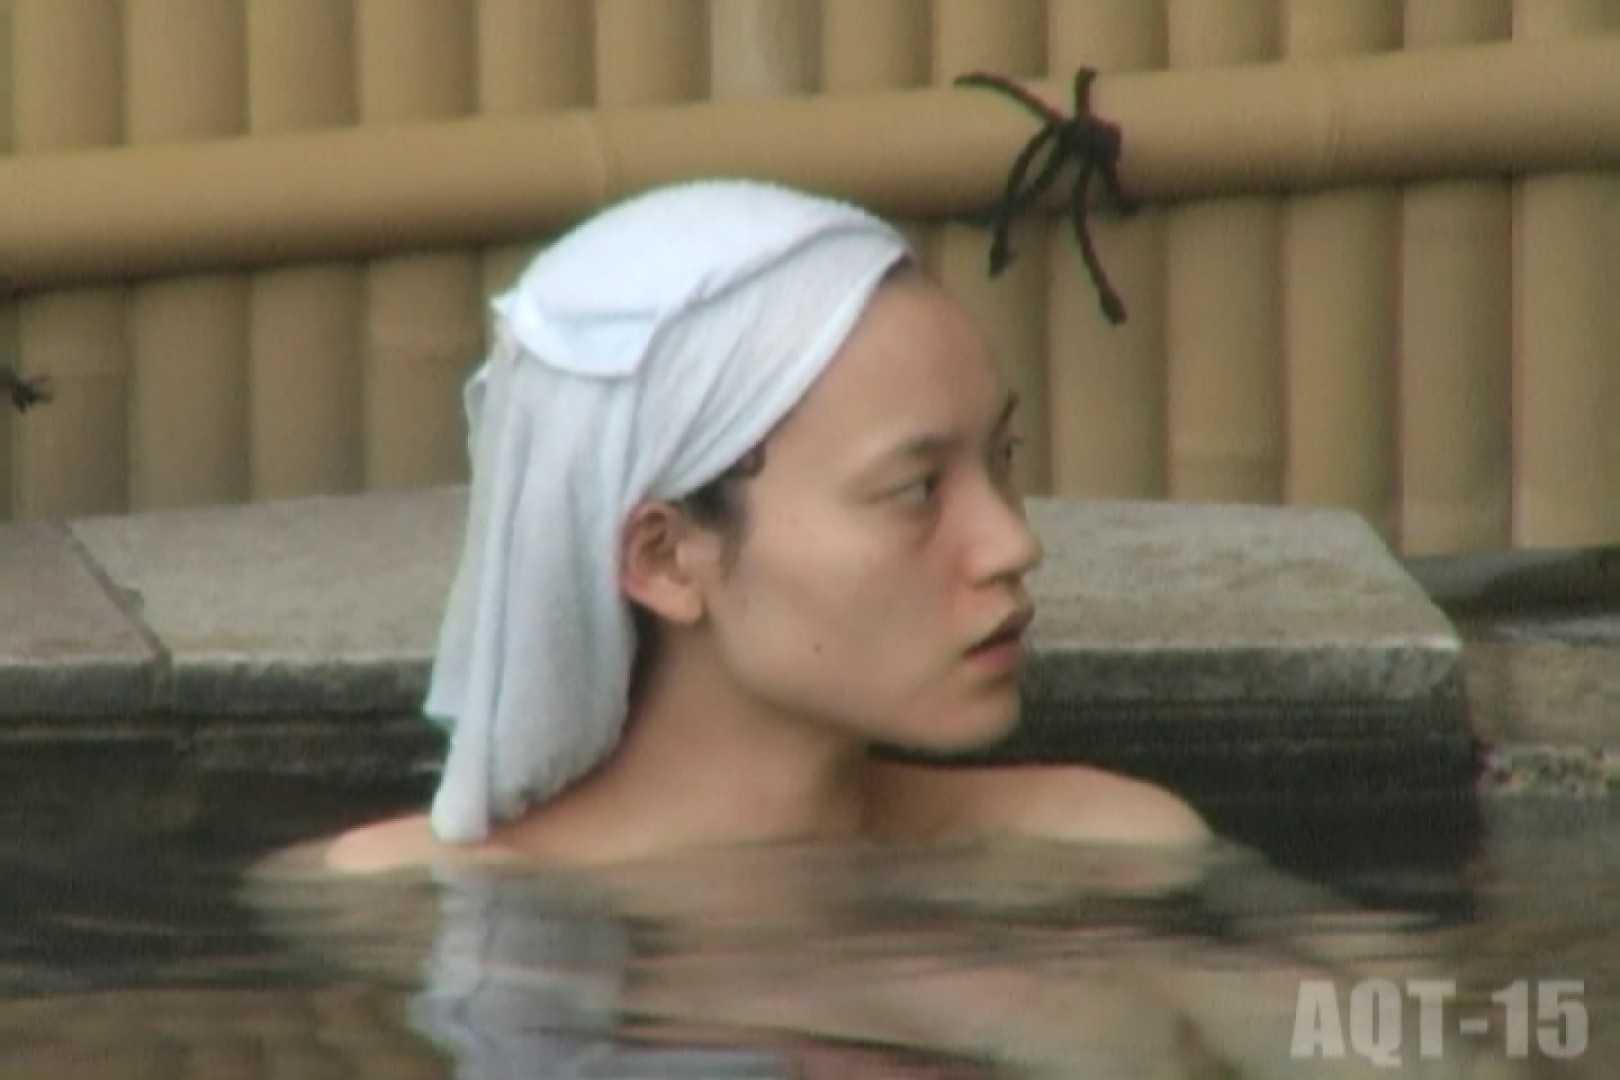 Aquaな露天風呂Vol.836 OLセックス 隠し撮りおまんこ動画流出 102画像 80